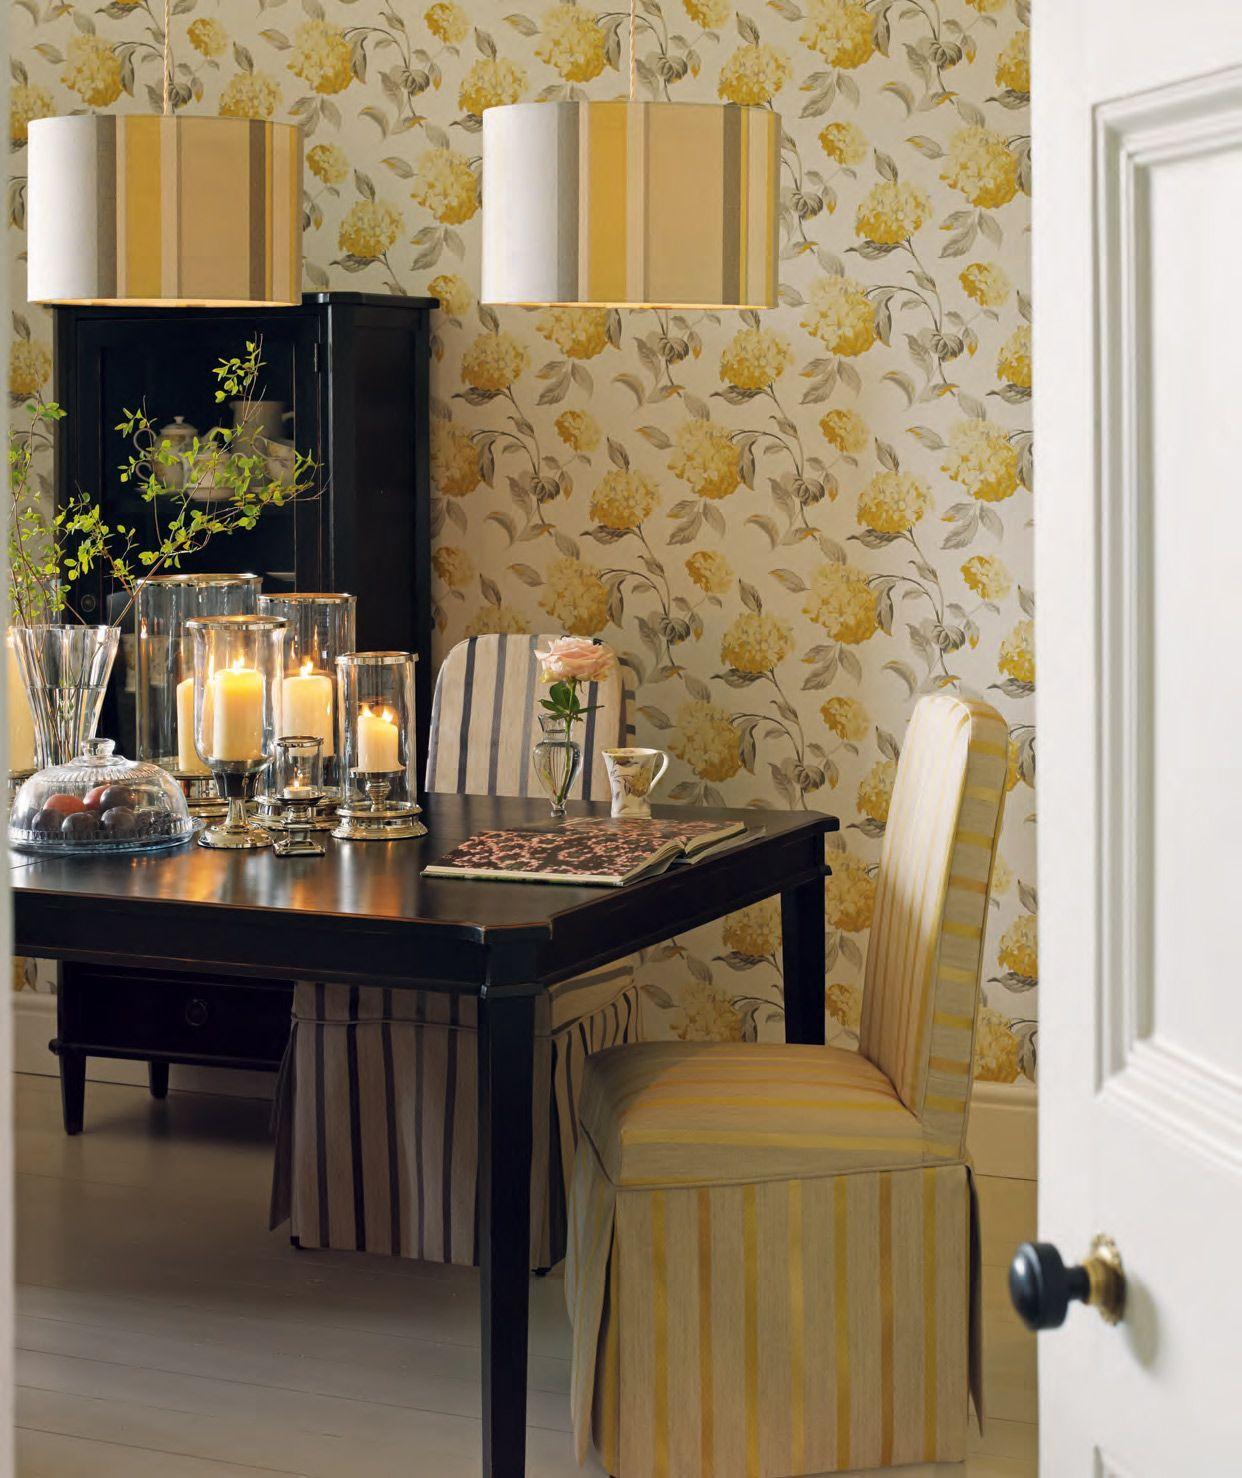 Laura Ashley Furniture Buying Guide | eBay